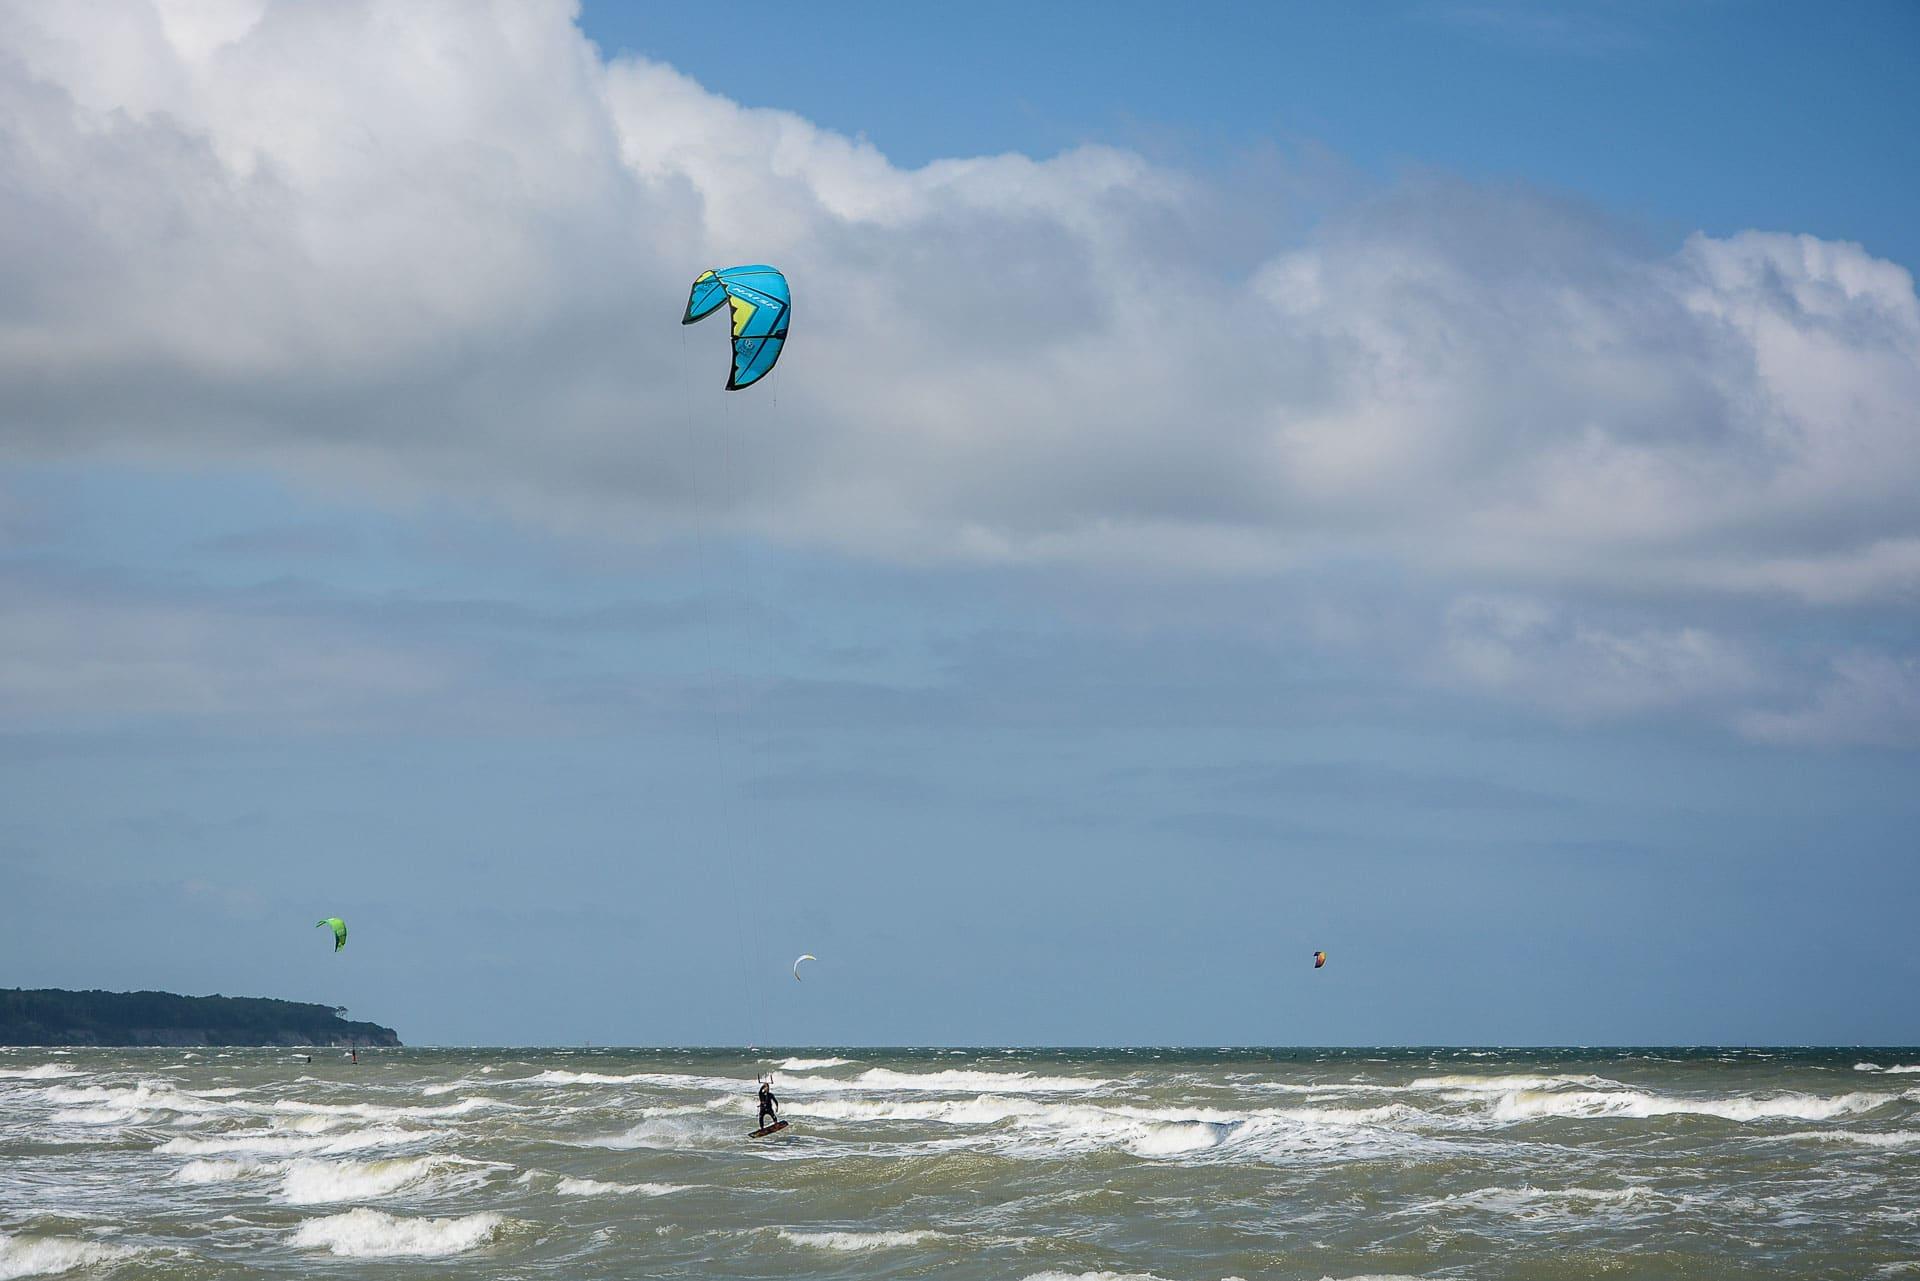 Ostsee: Kitesurfen am Ostseestrand in Rostock Warnemünde - Mecklenburg Vorpommern